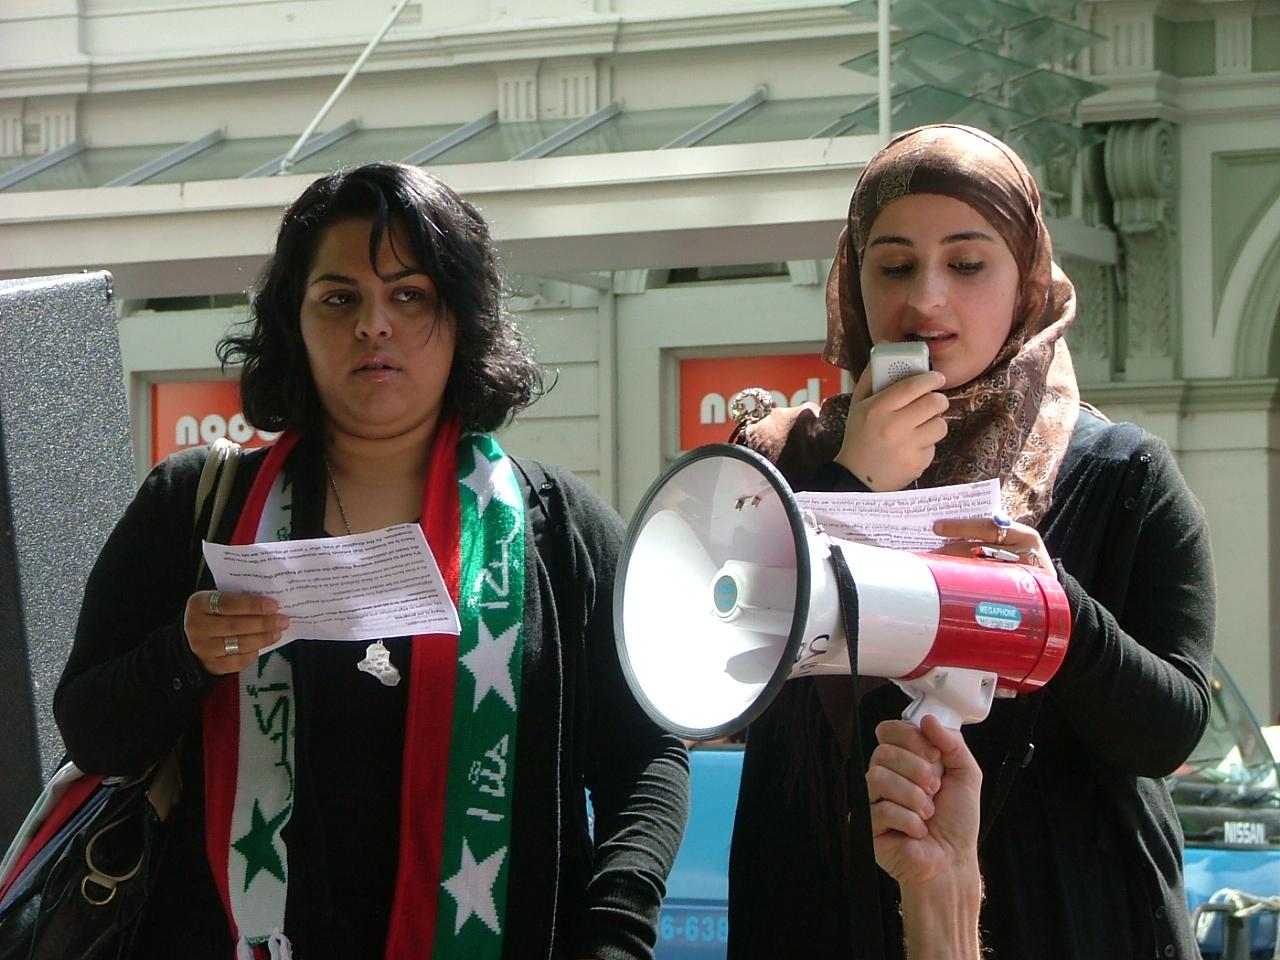 Iraqi women condemnig the occupation